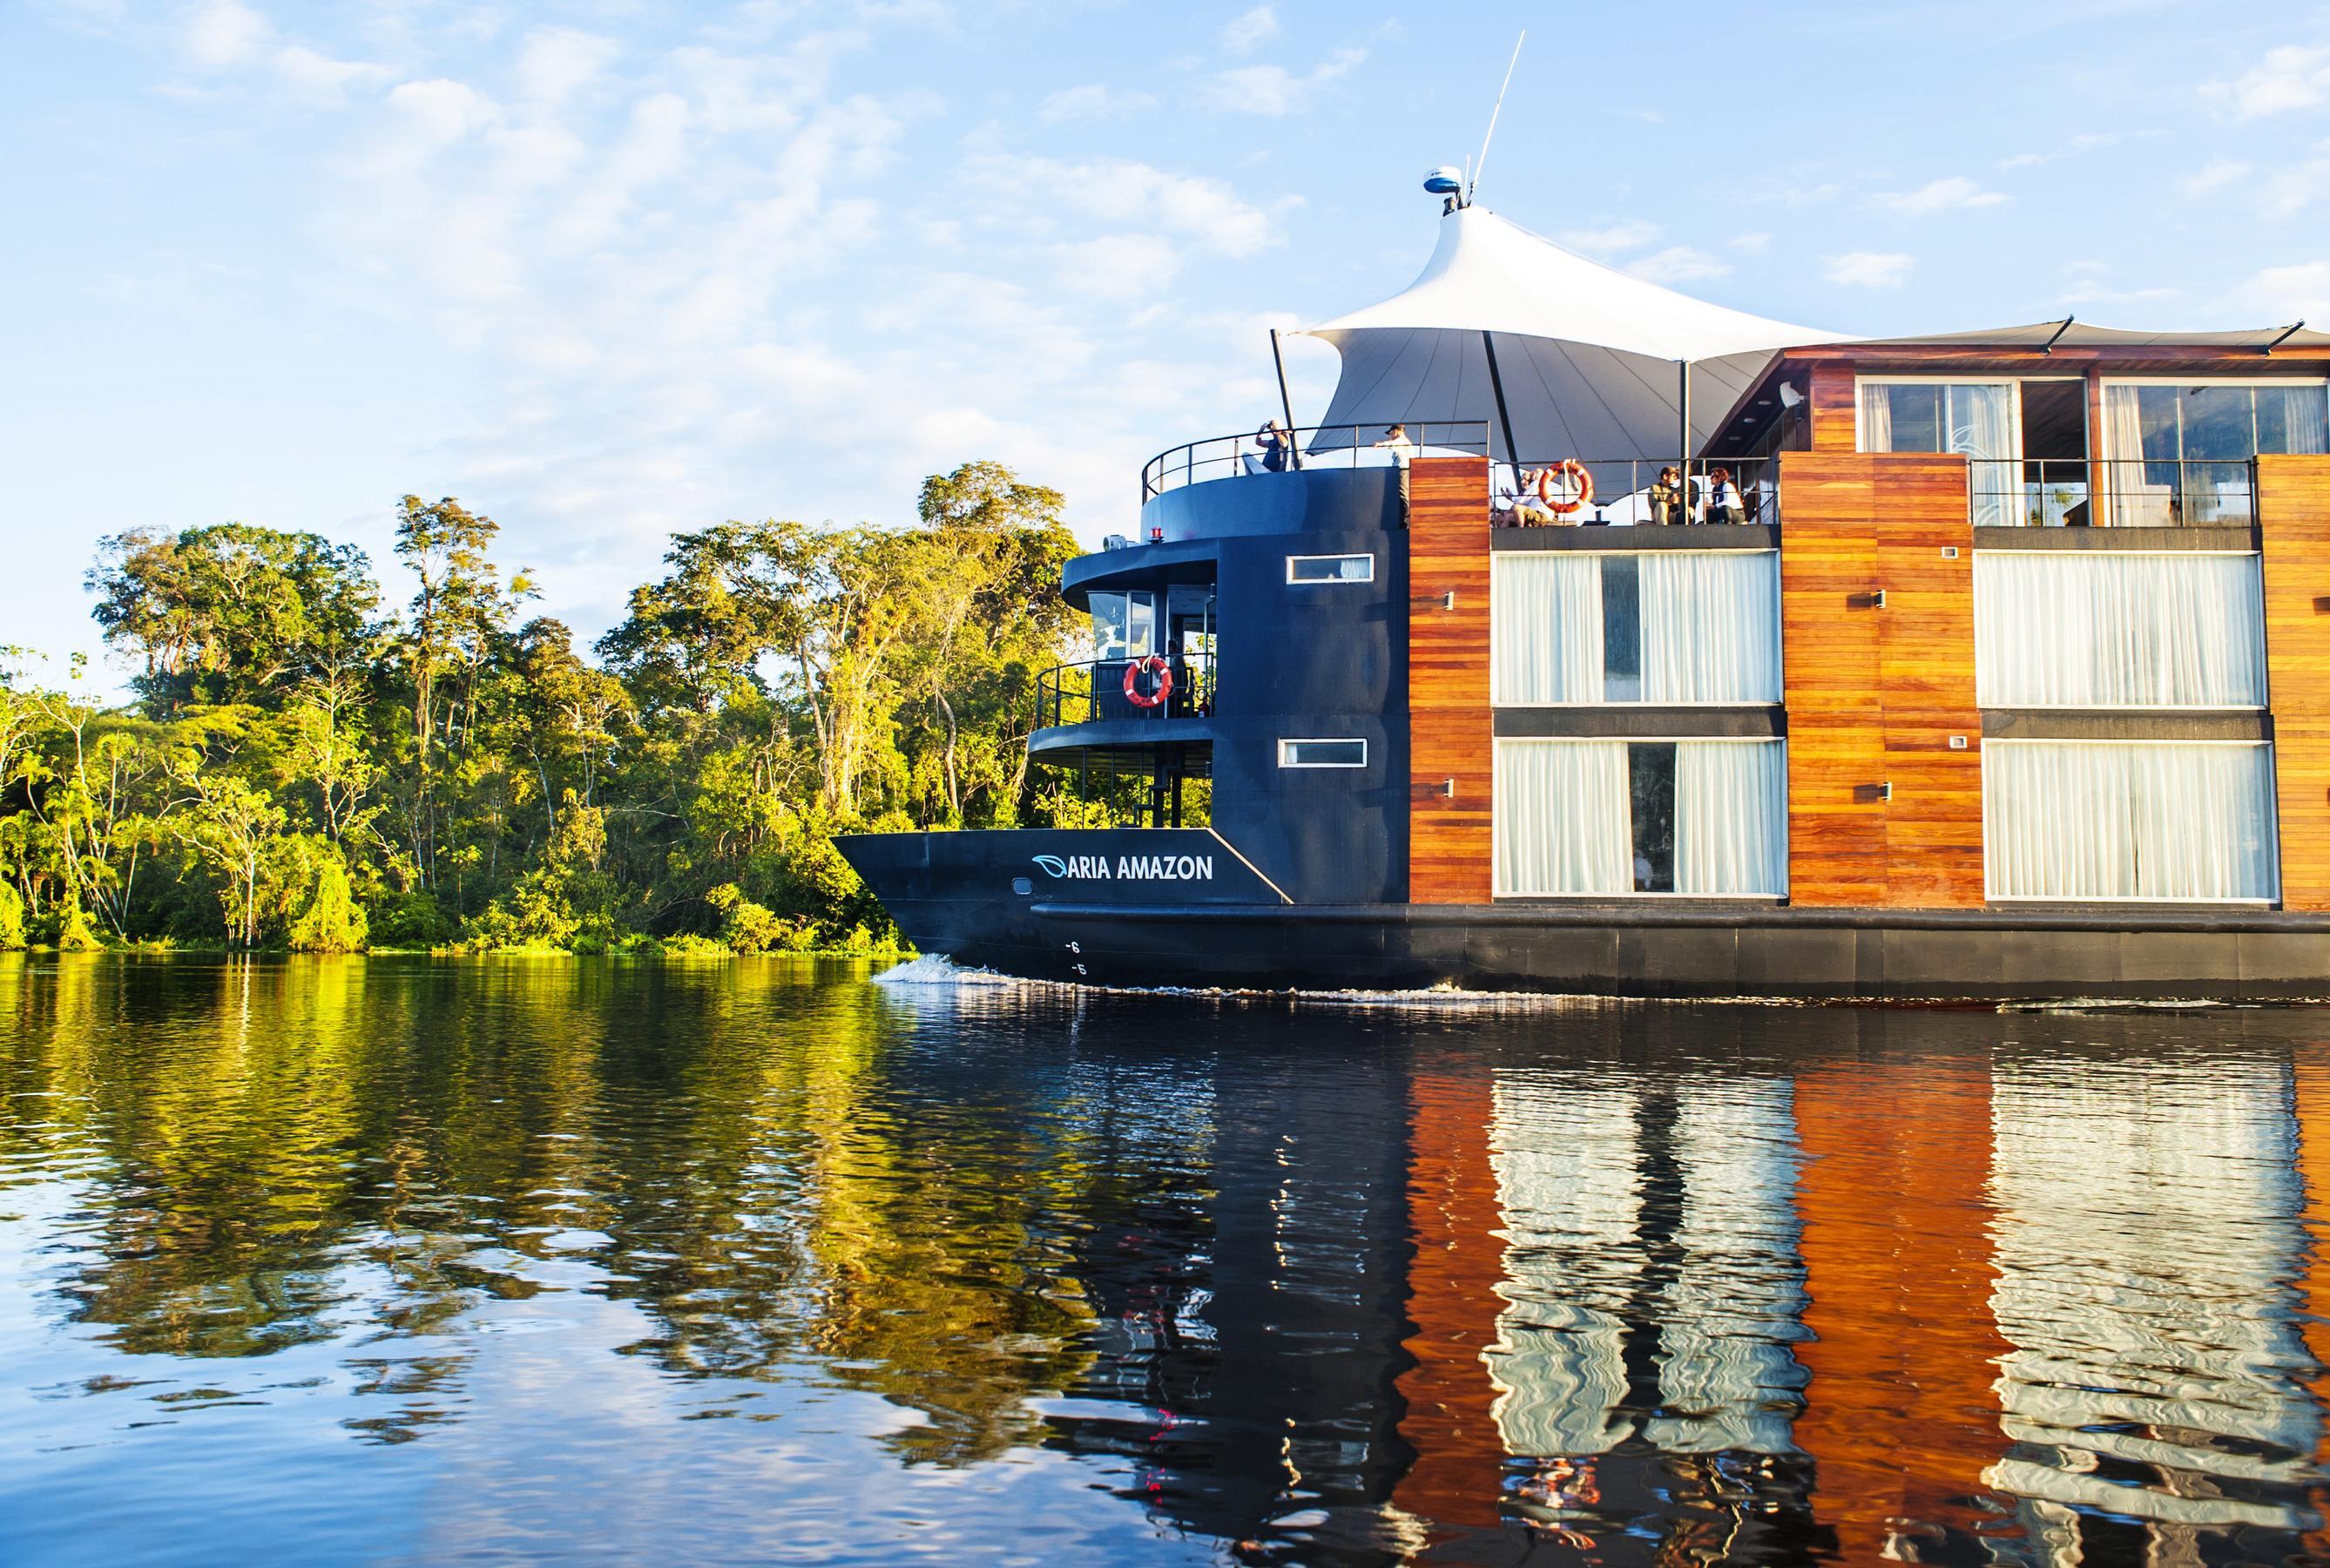 New 8_2015 Aria Amazon Exterior View 3 - High Resolution